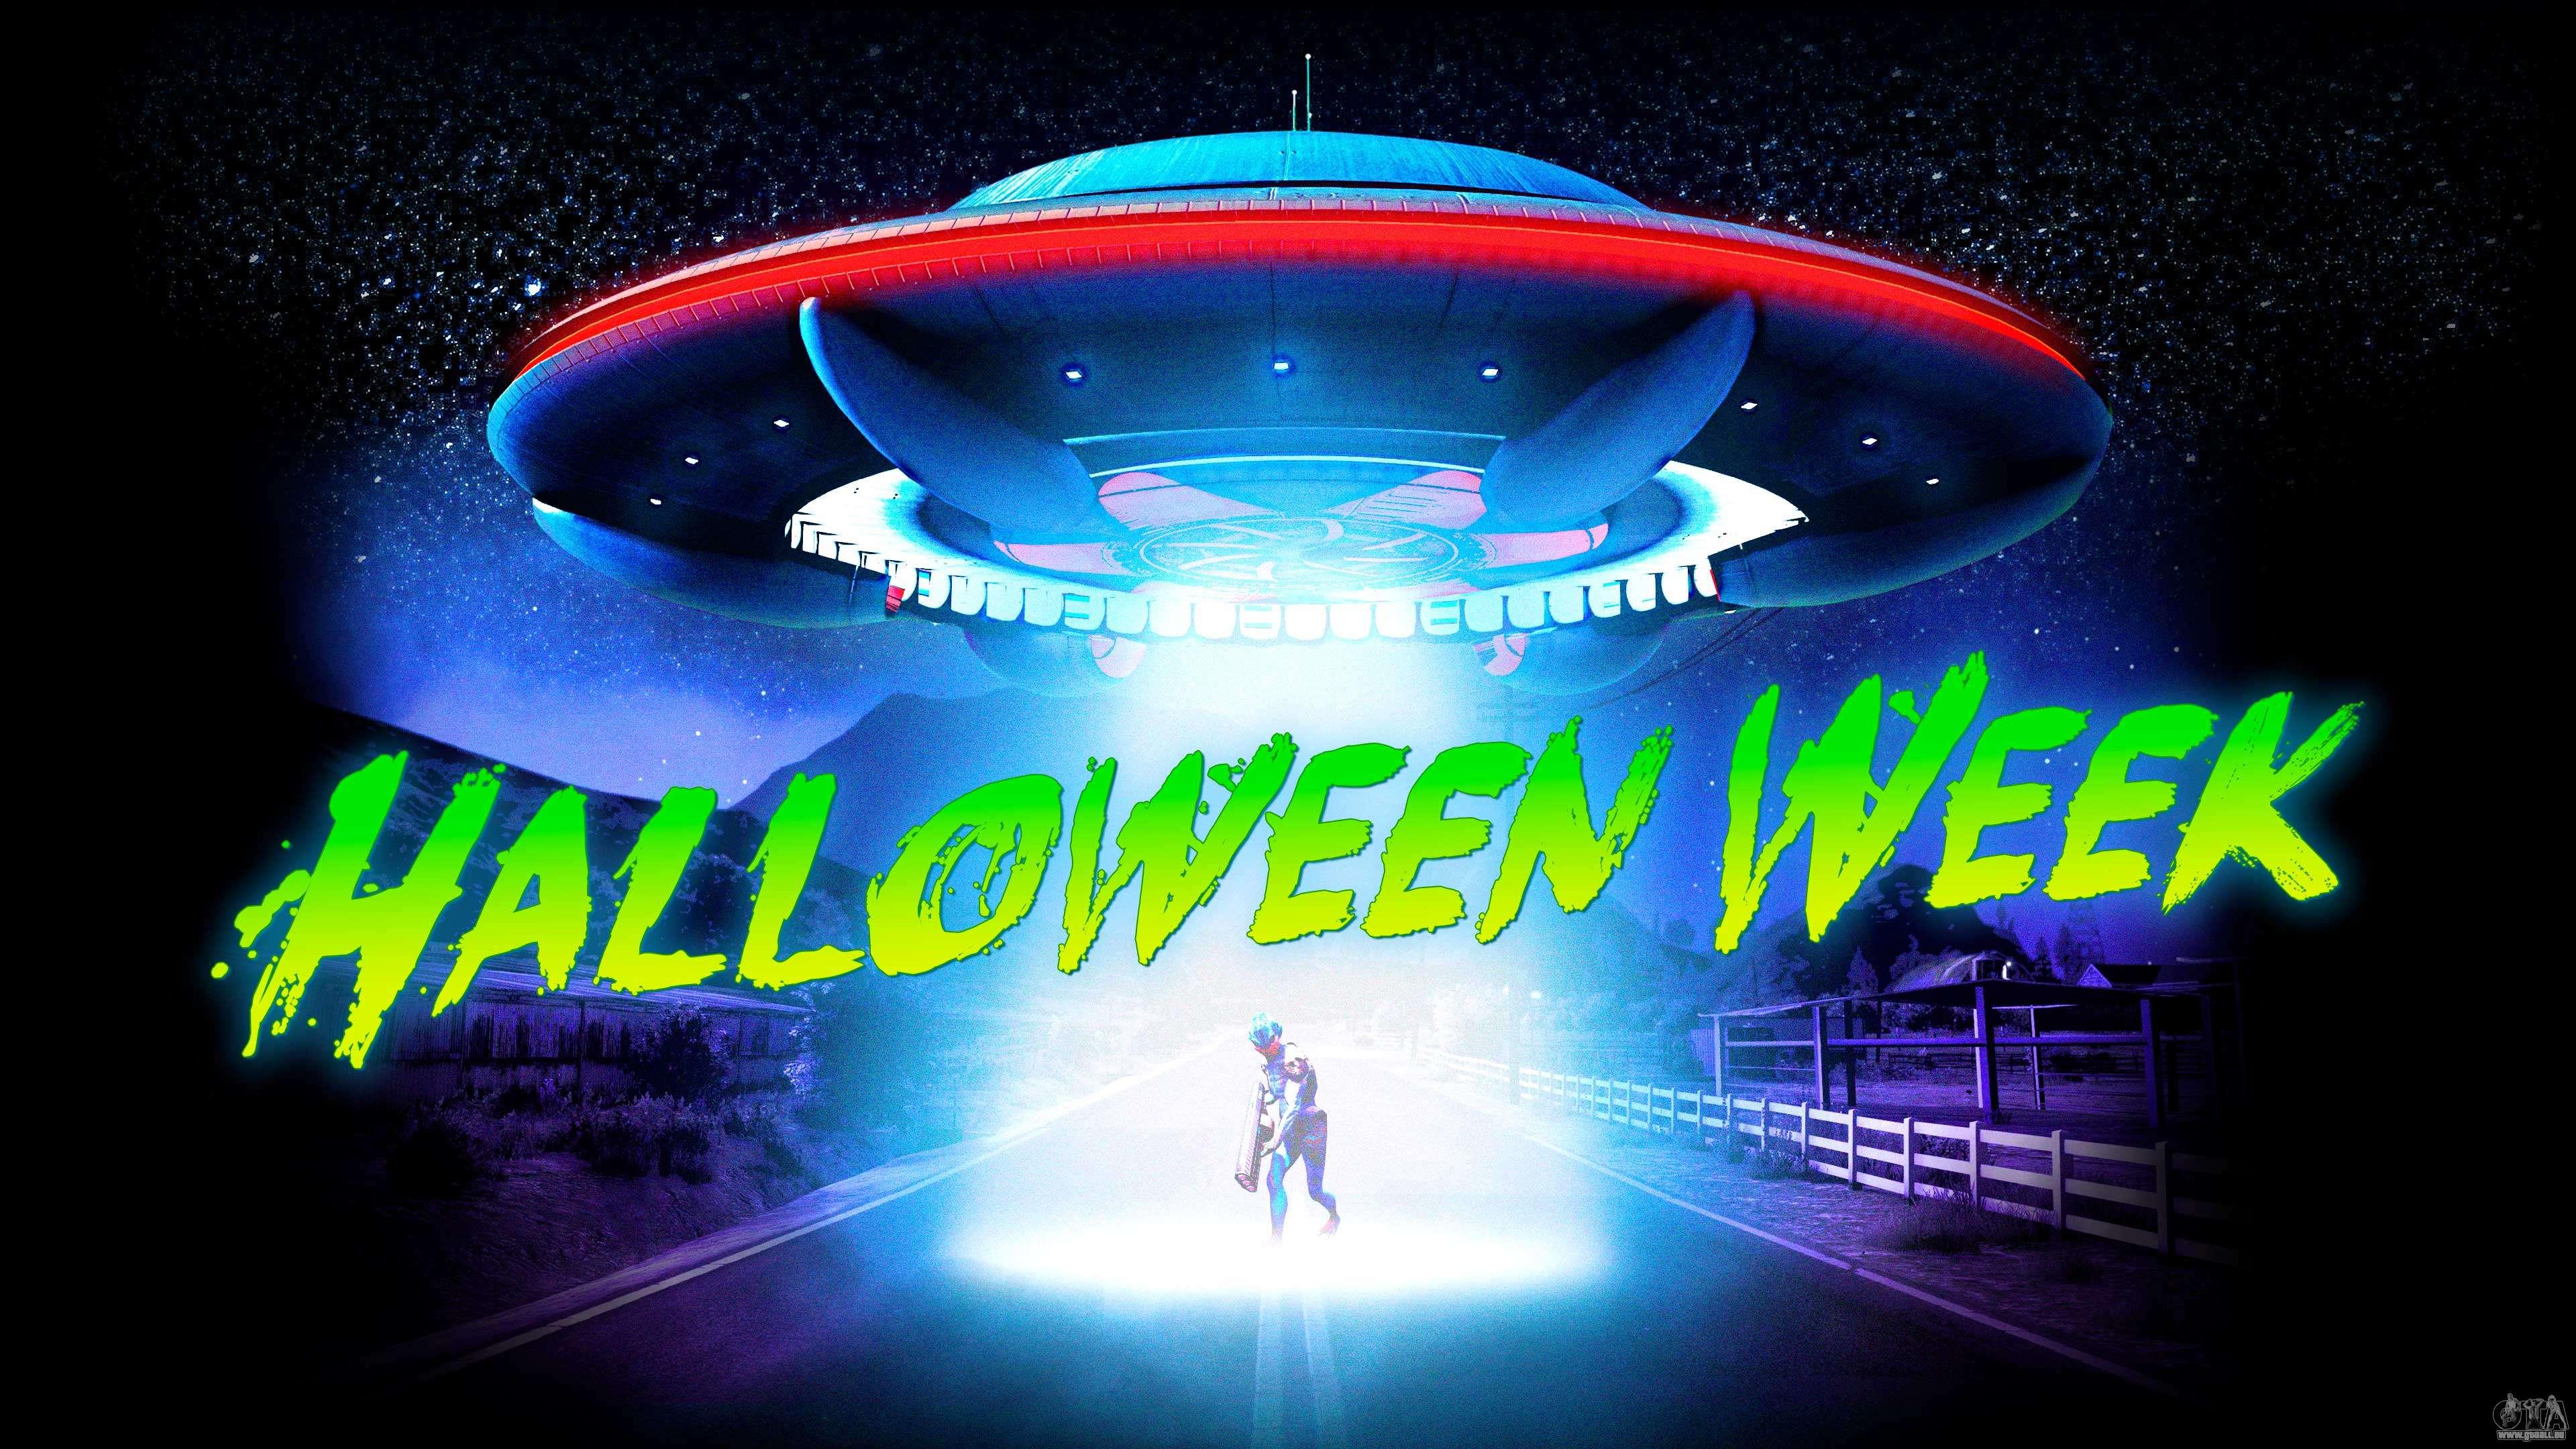 Semaine d'Halloween à GTA Online